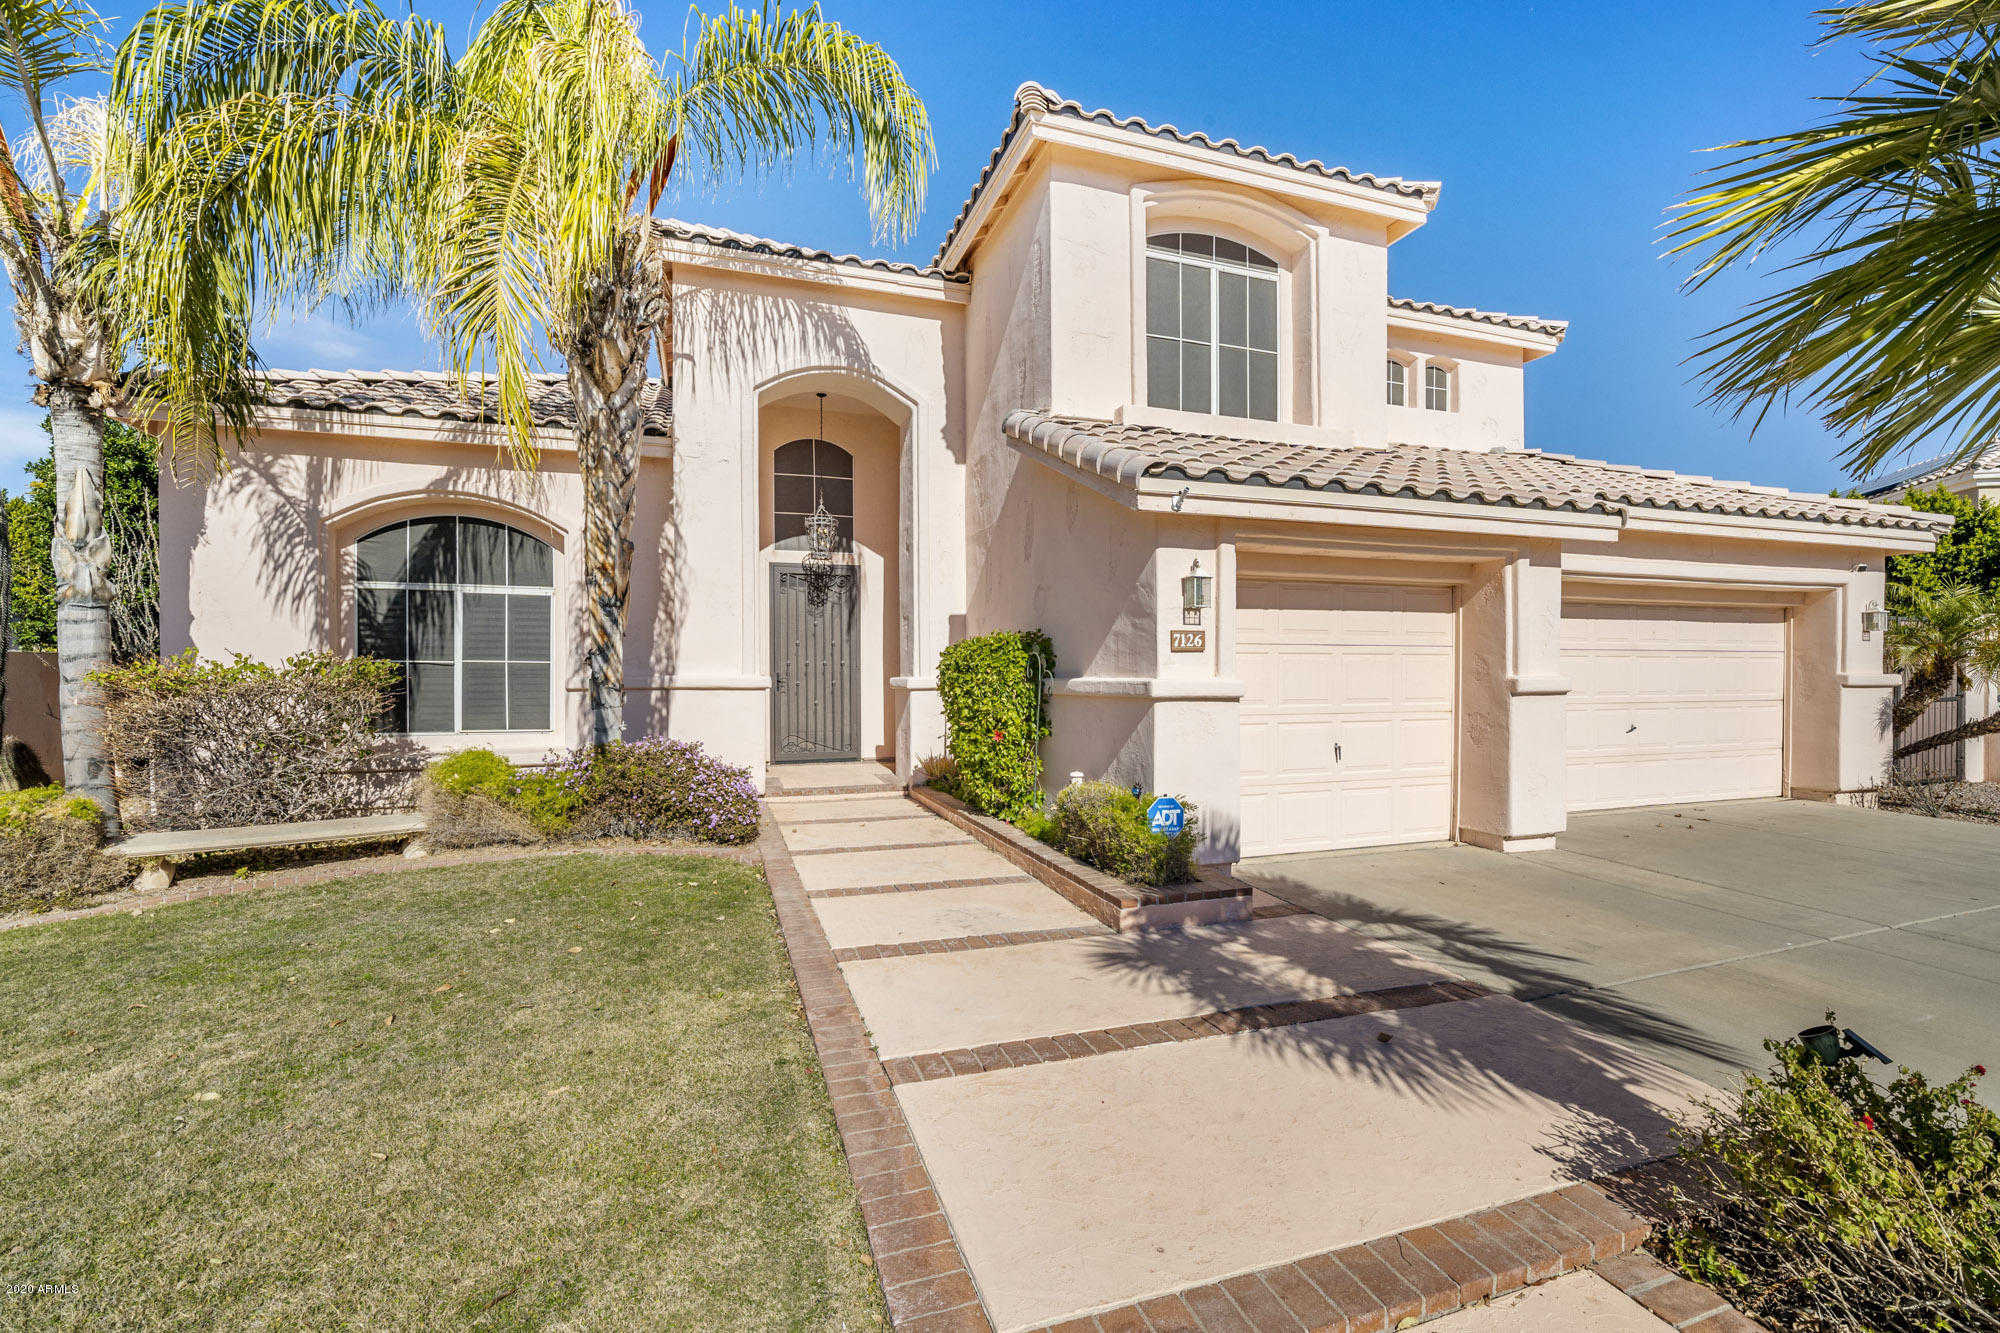 $499,900 - 5Br/3Ba - Home for Sale in Hillcrest Ranch, Glendale